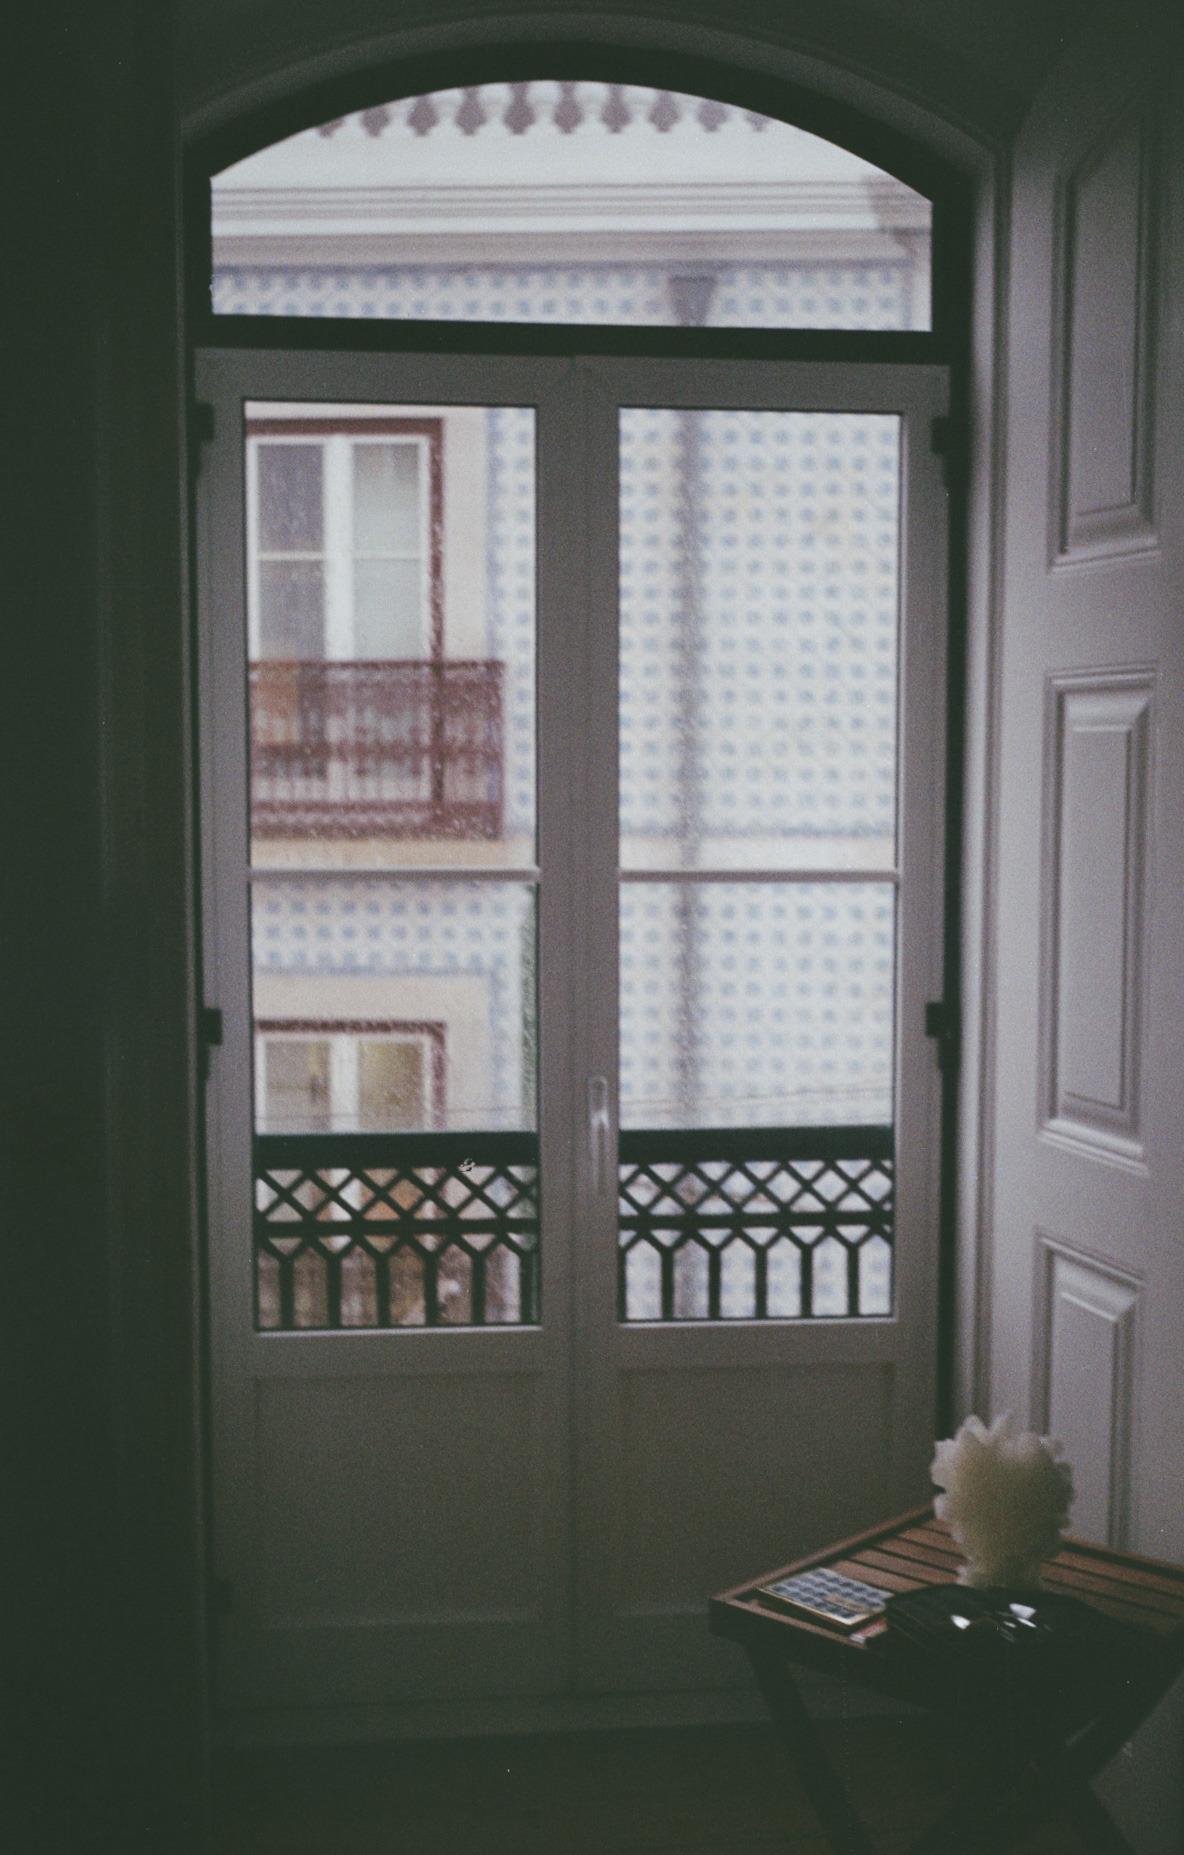 annetterotz_photography_windows2.jpg